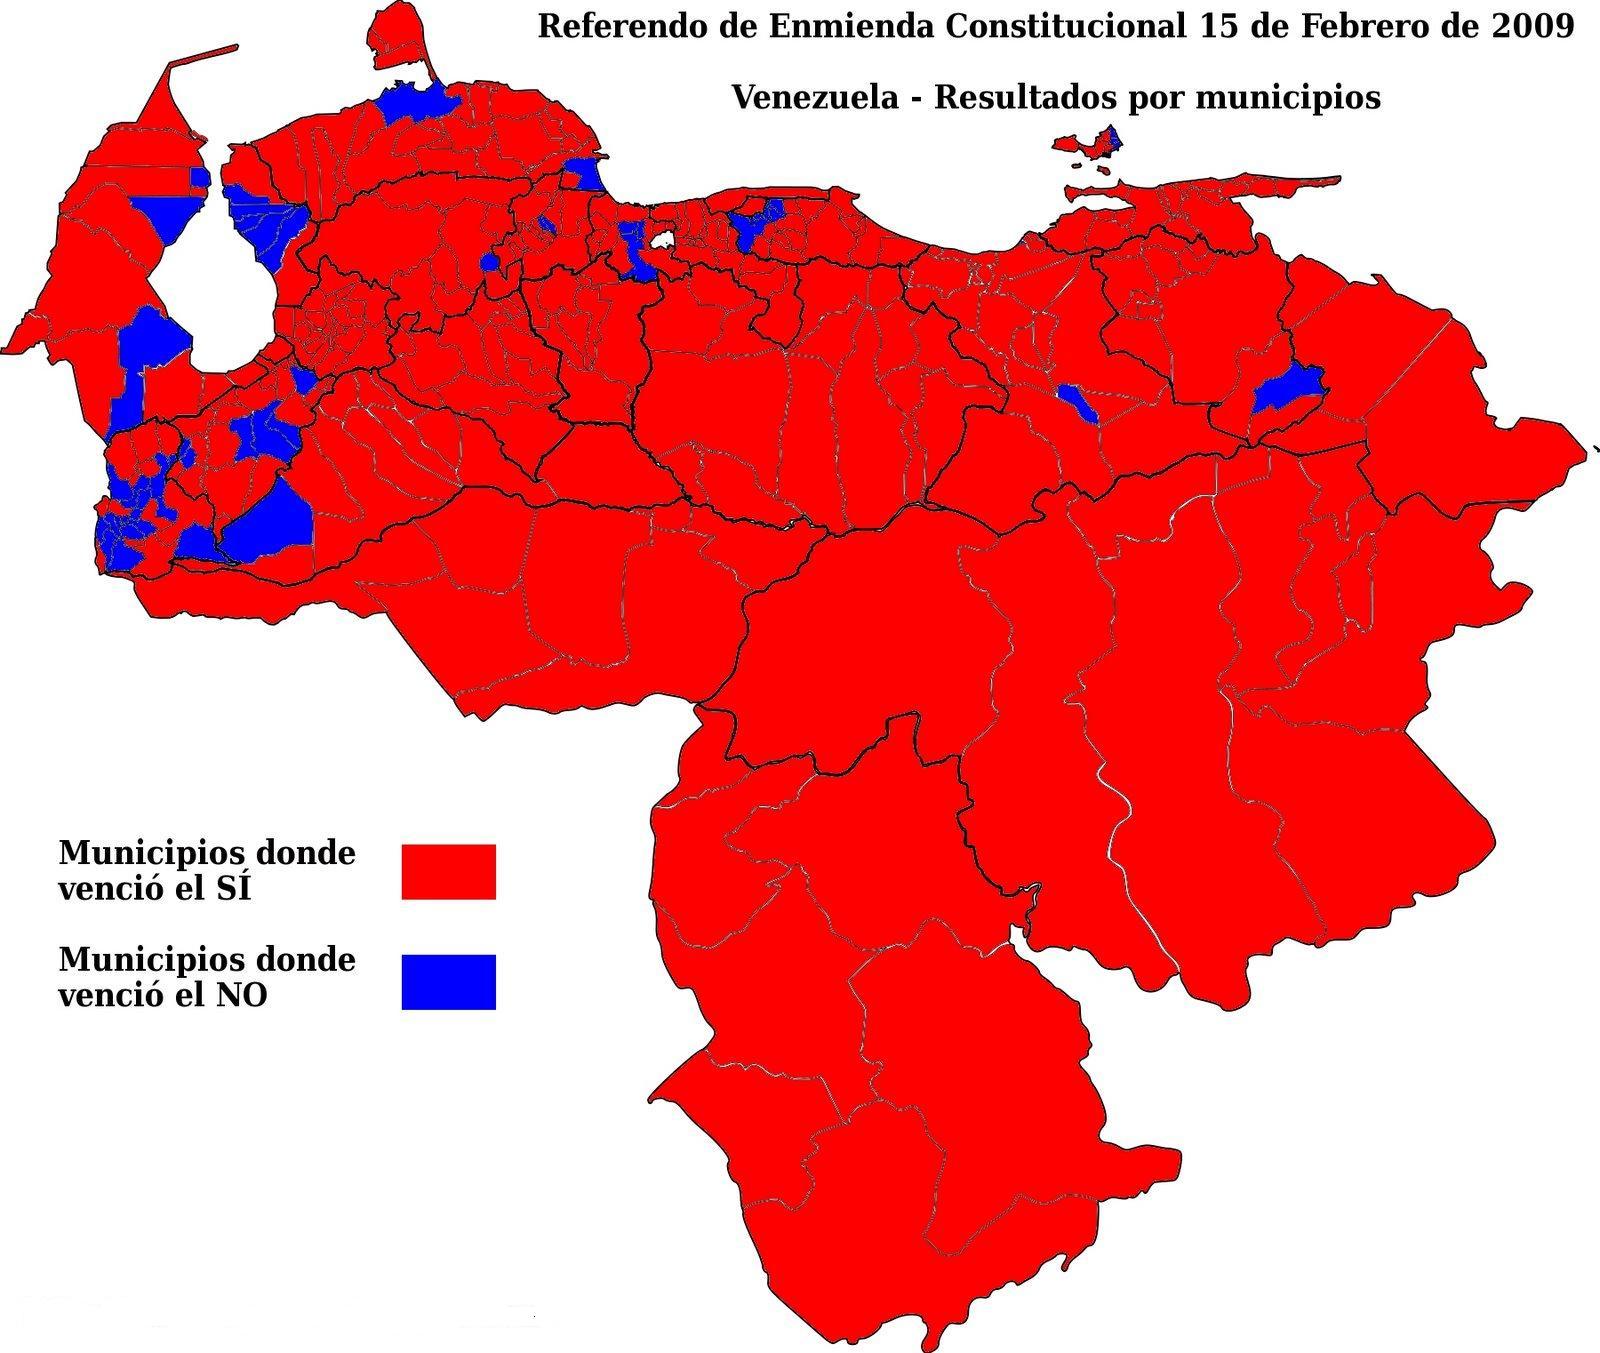 municipios-con-el-si-fidelvasquez.jpg